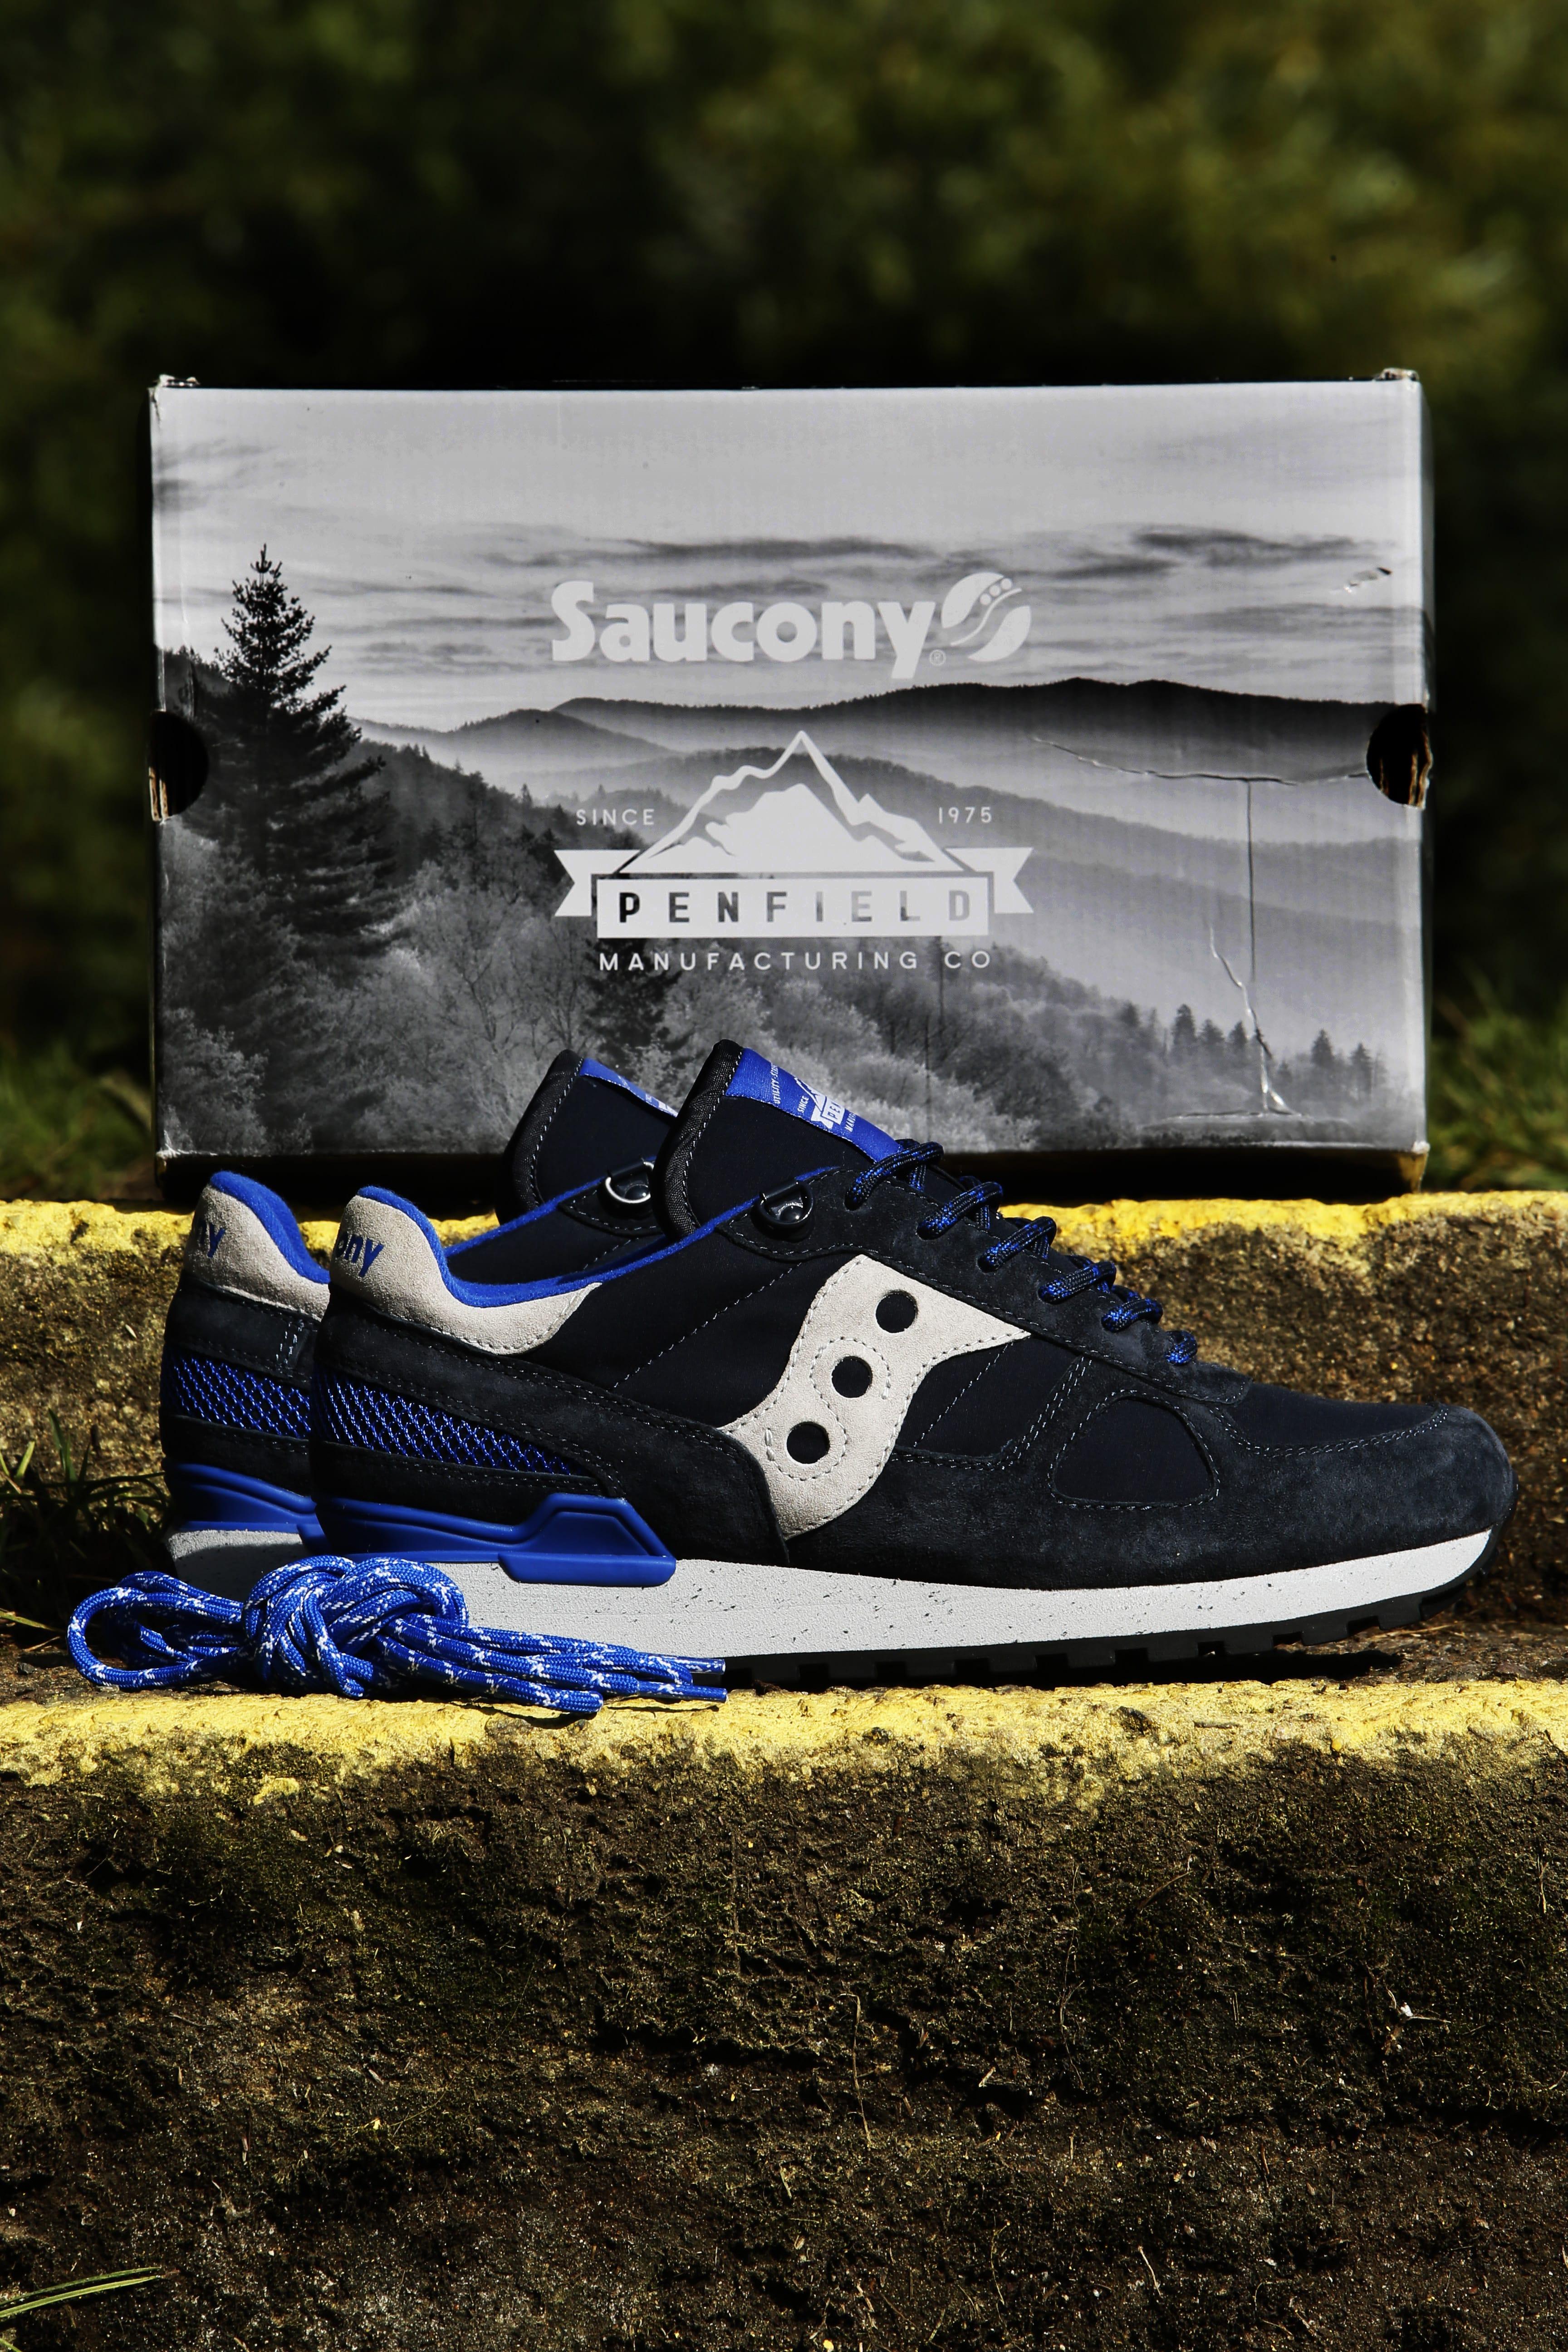 penfield x saucony shoes